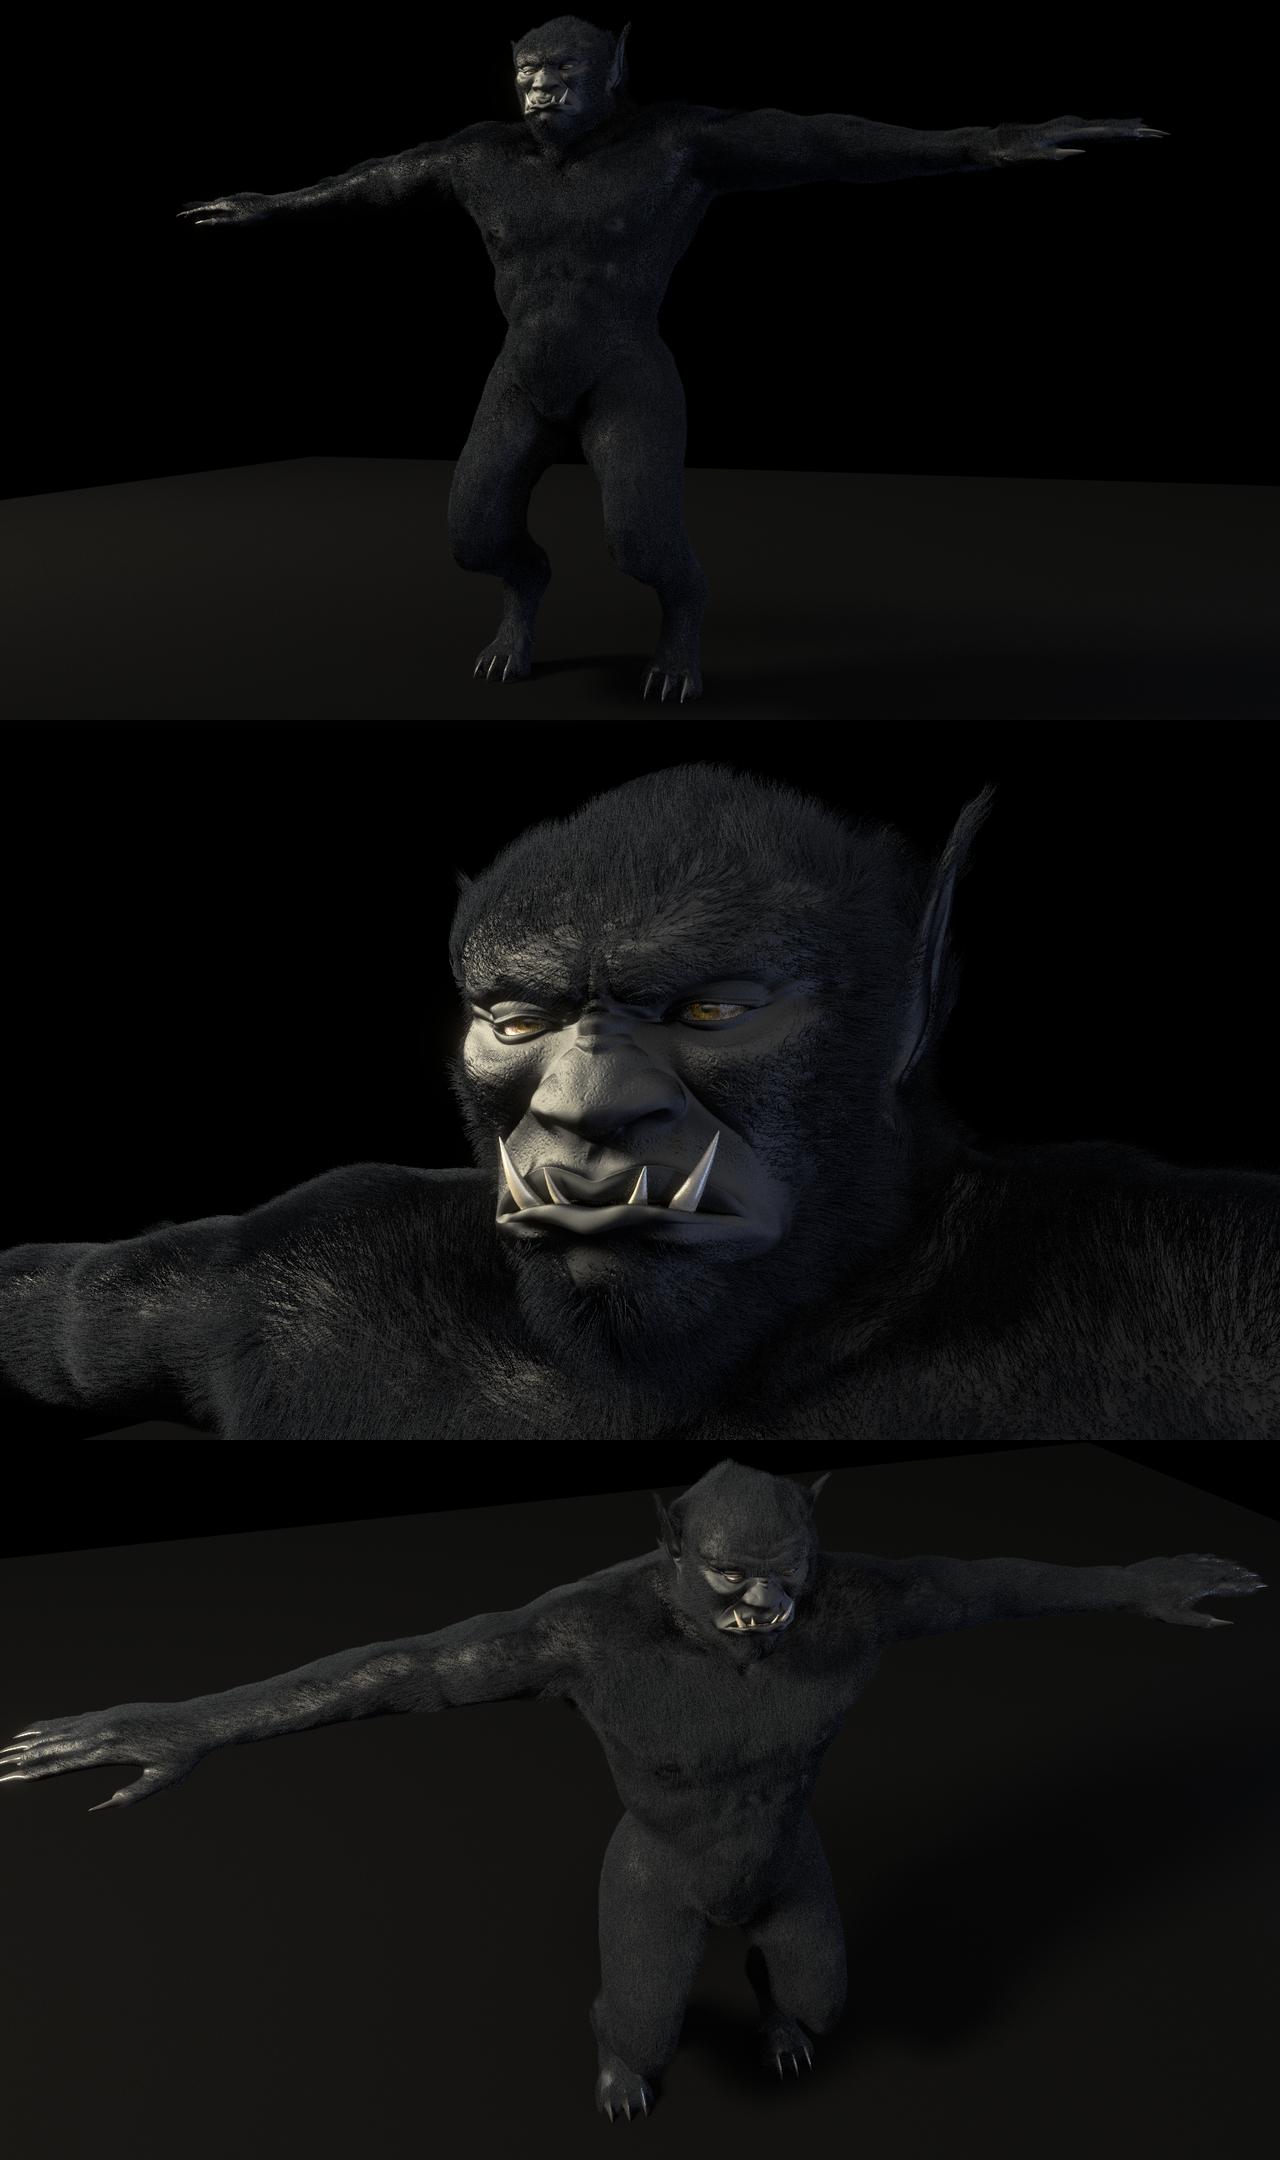 The Black Ogre of Genetrix by paulrich